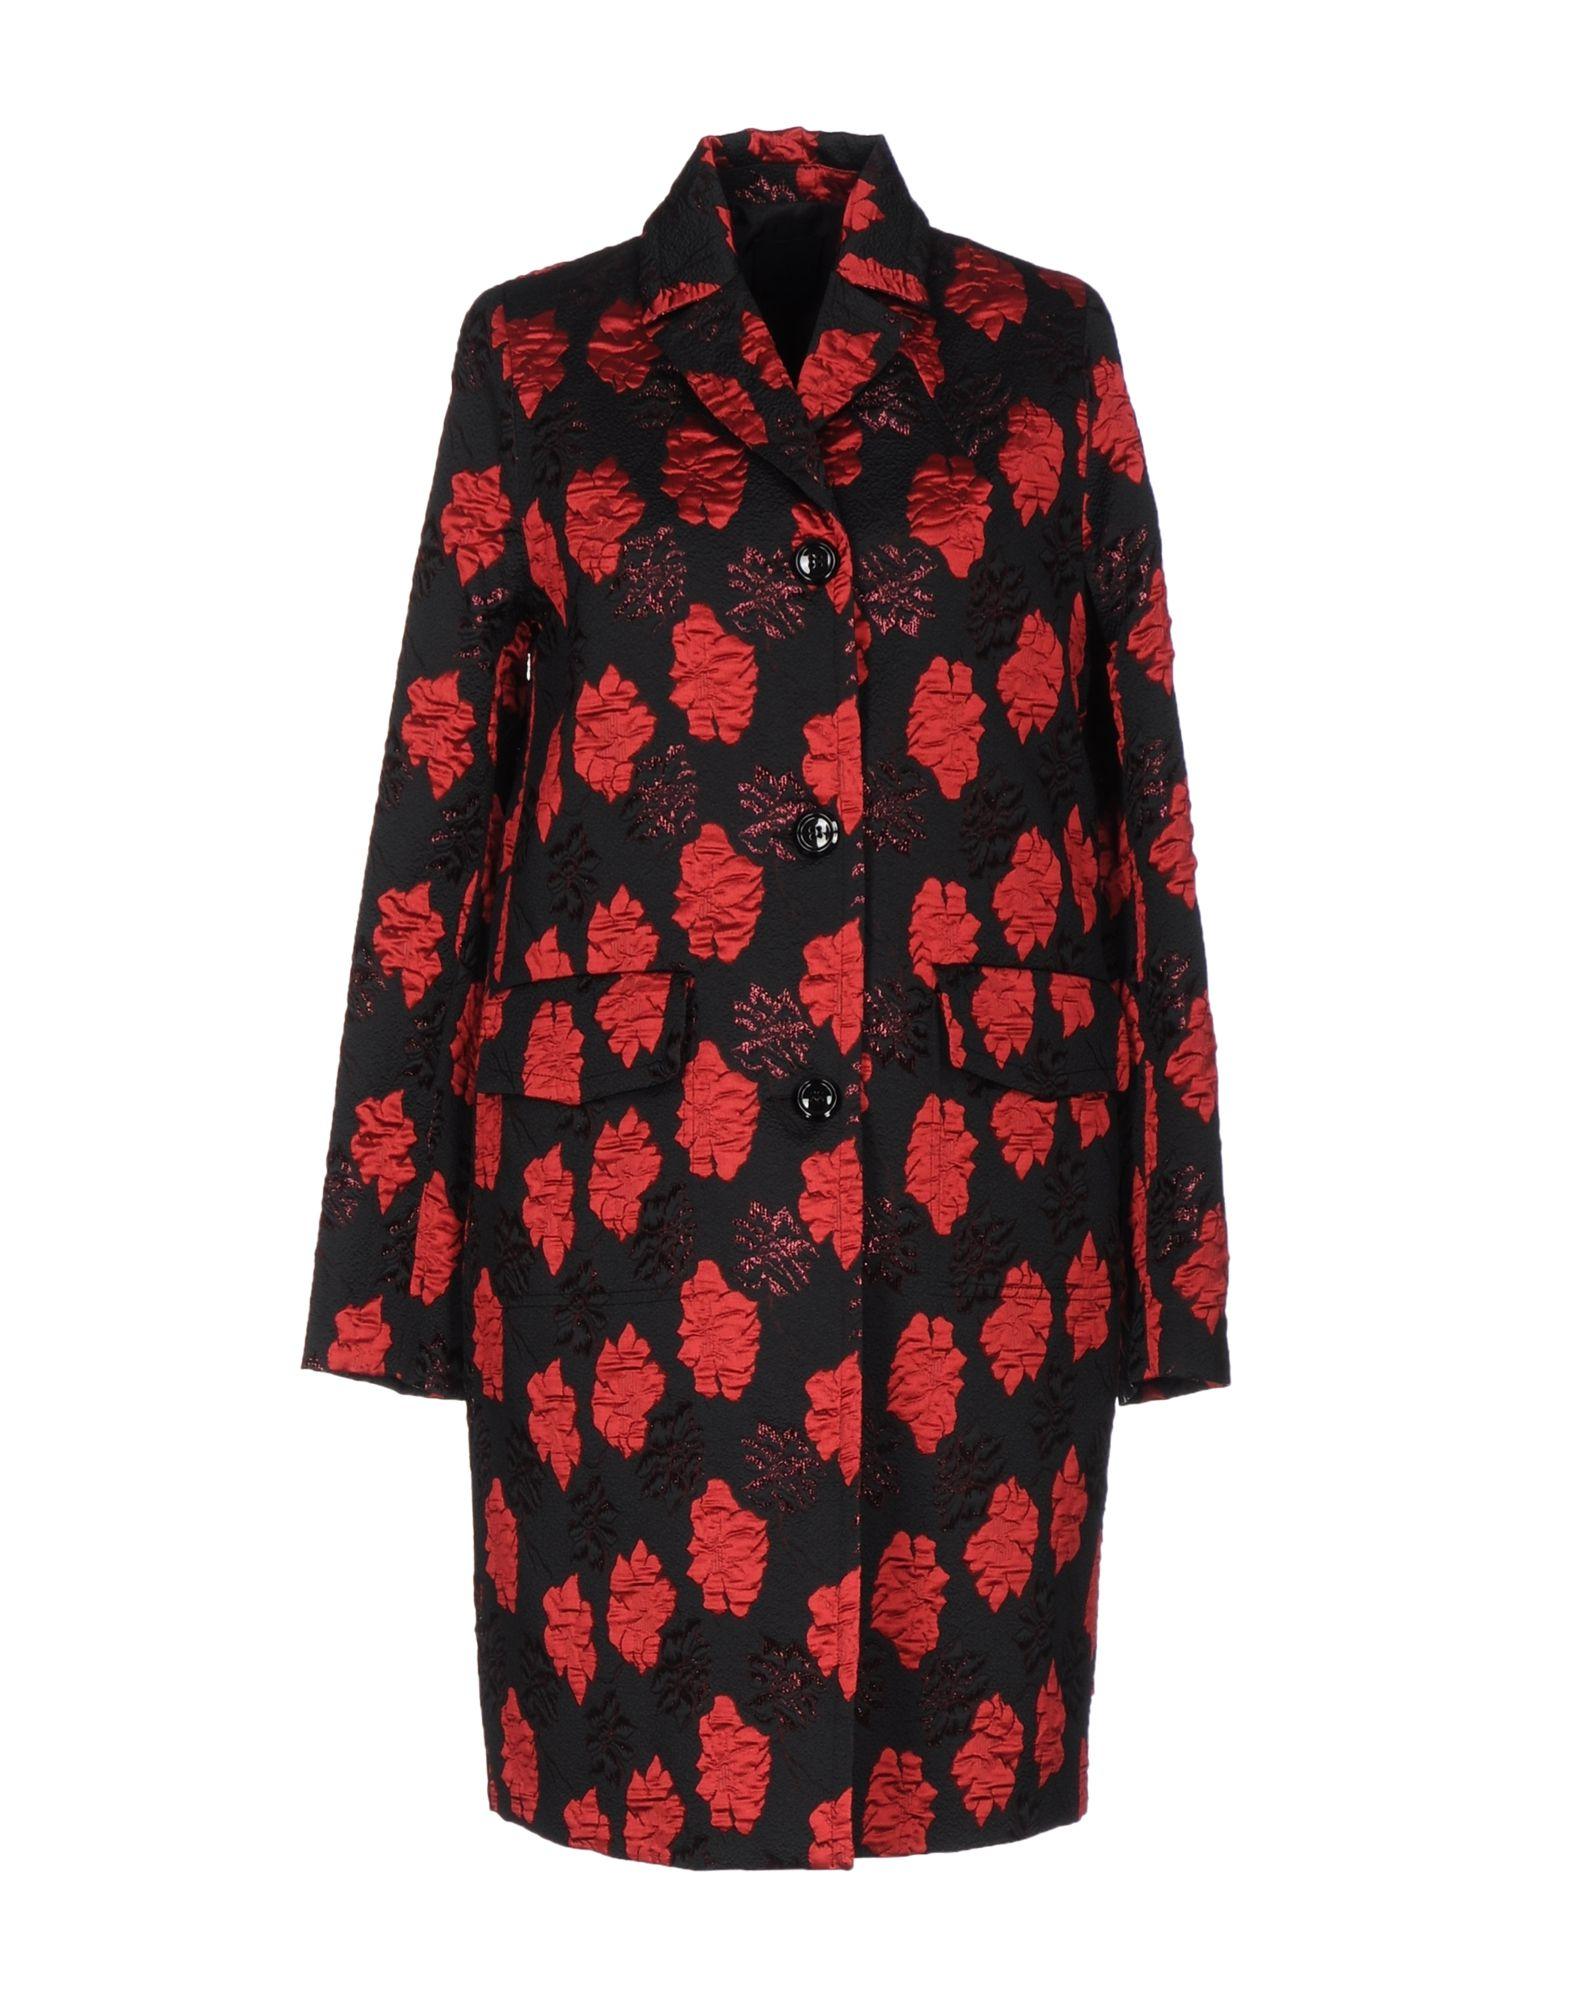 EGGS Coat in Red